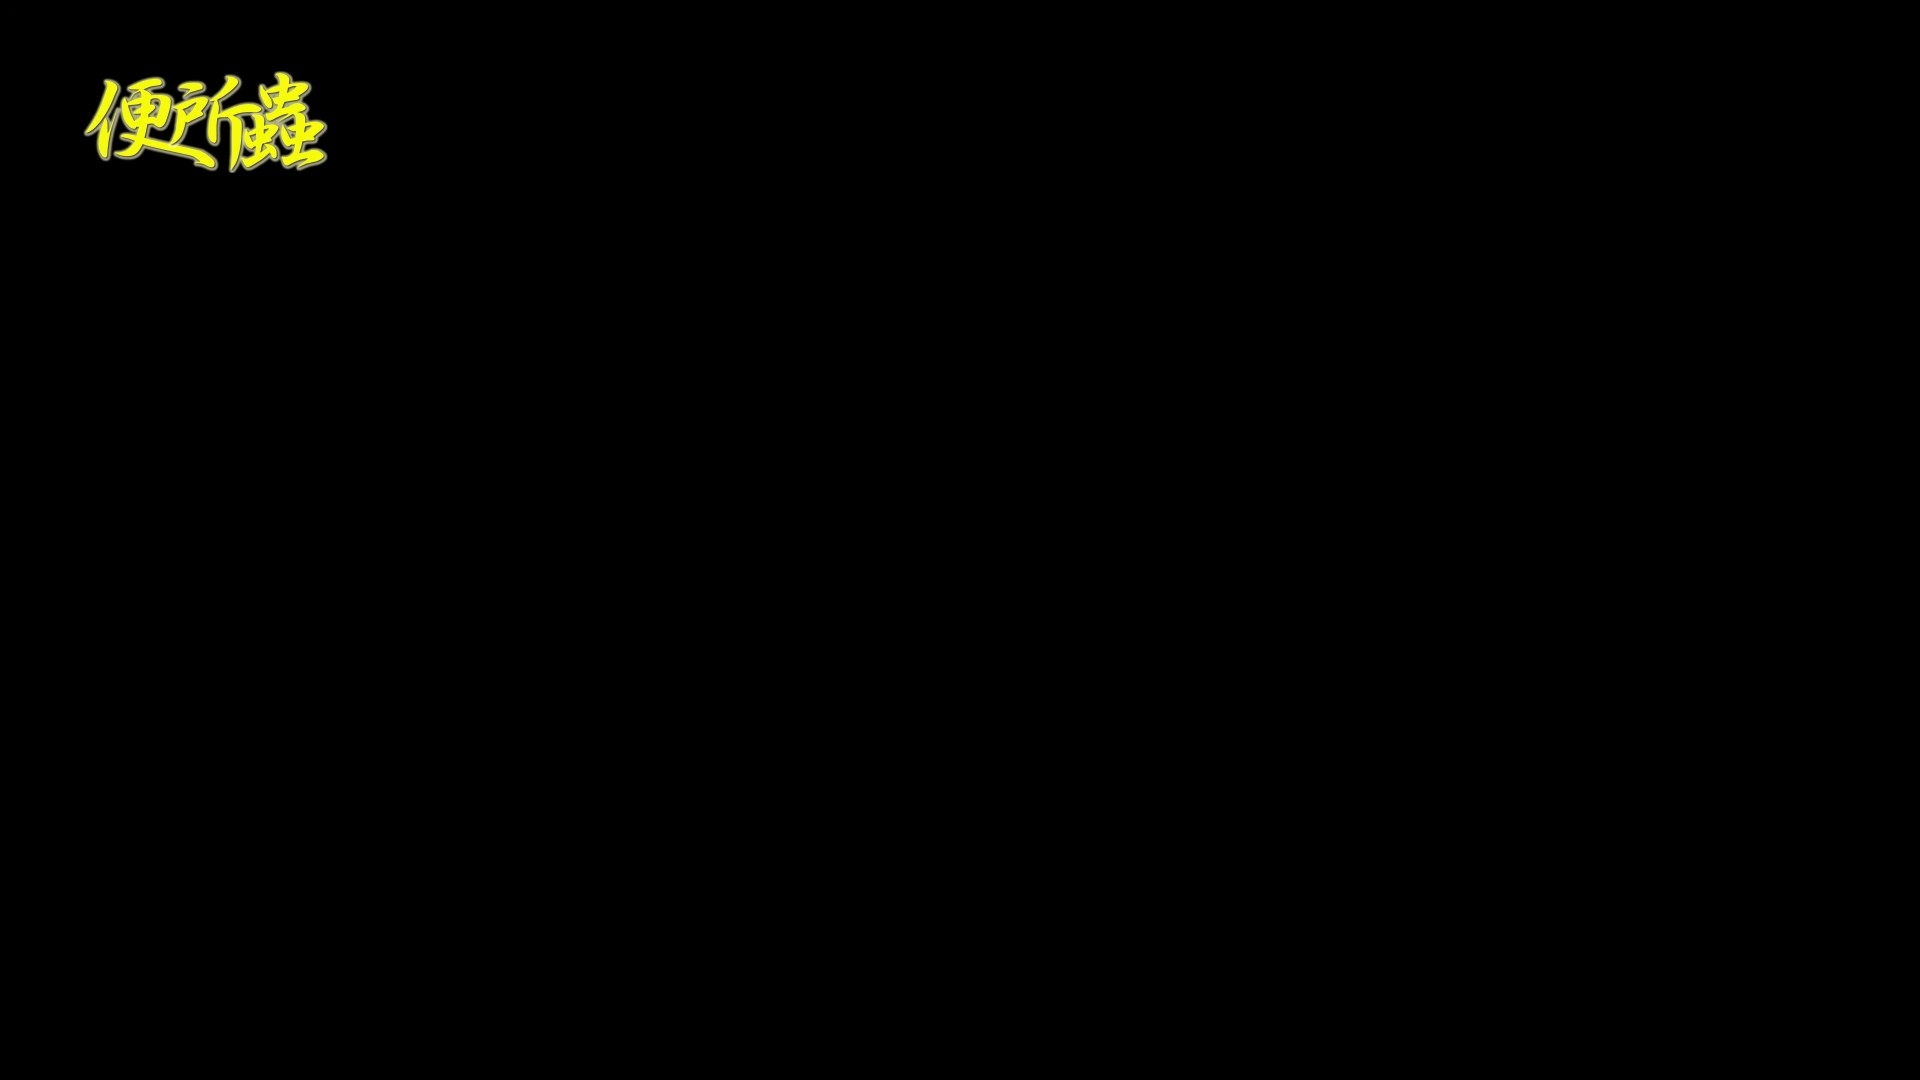 vol.02 便所蟲さんのリターン~寺子屋洗面所盗撮~ 盗撮で悶絶 AV無料 108画像 85